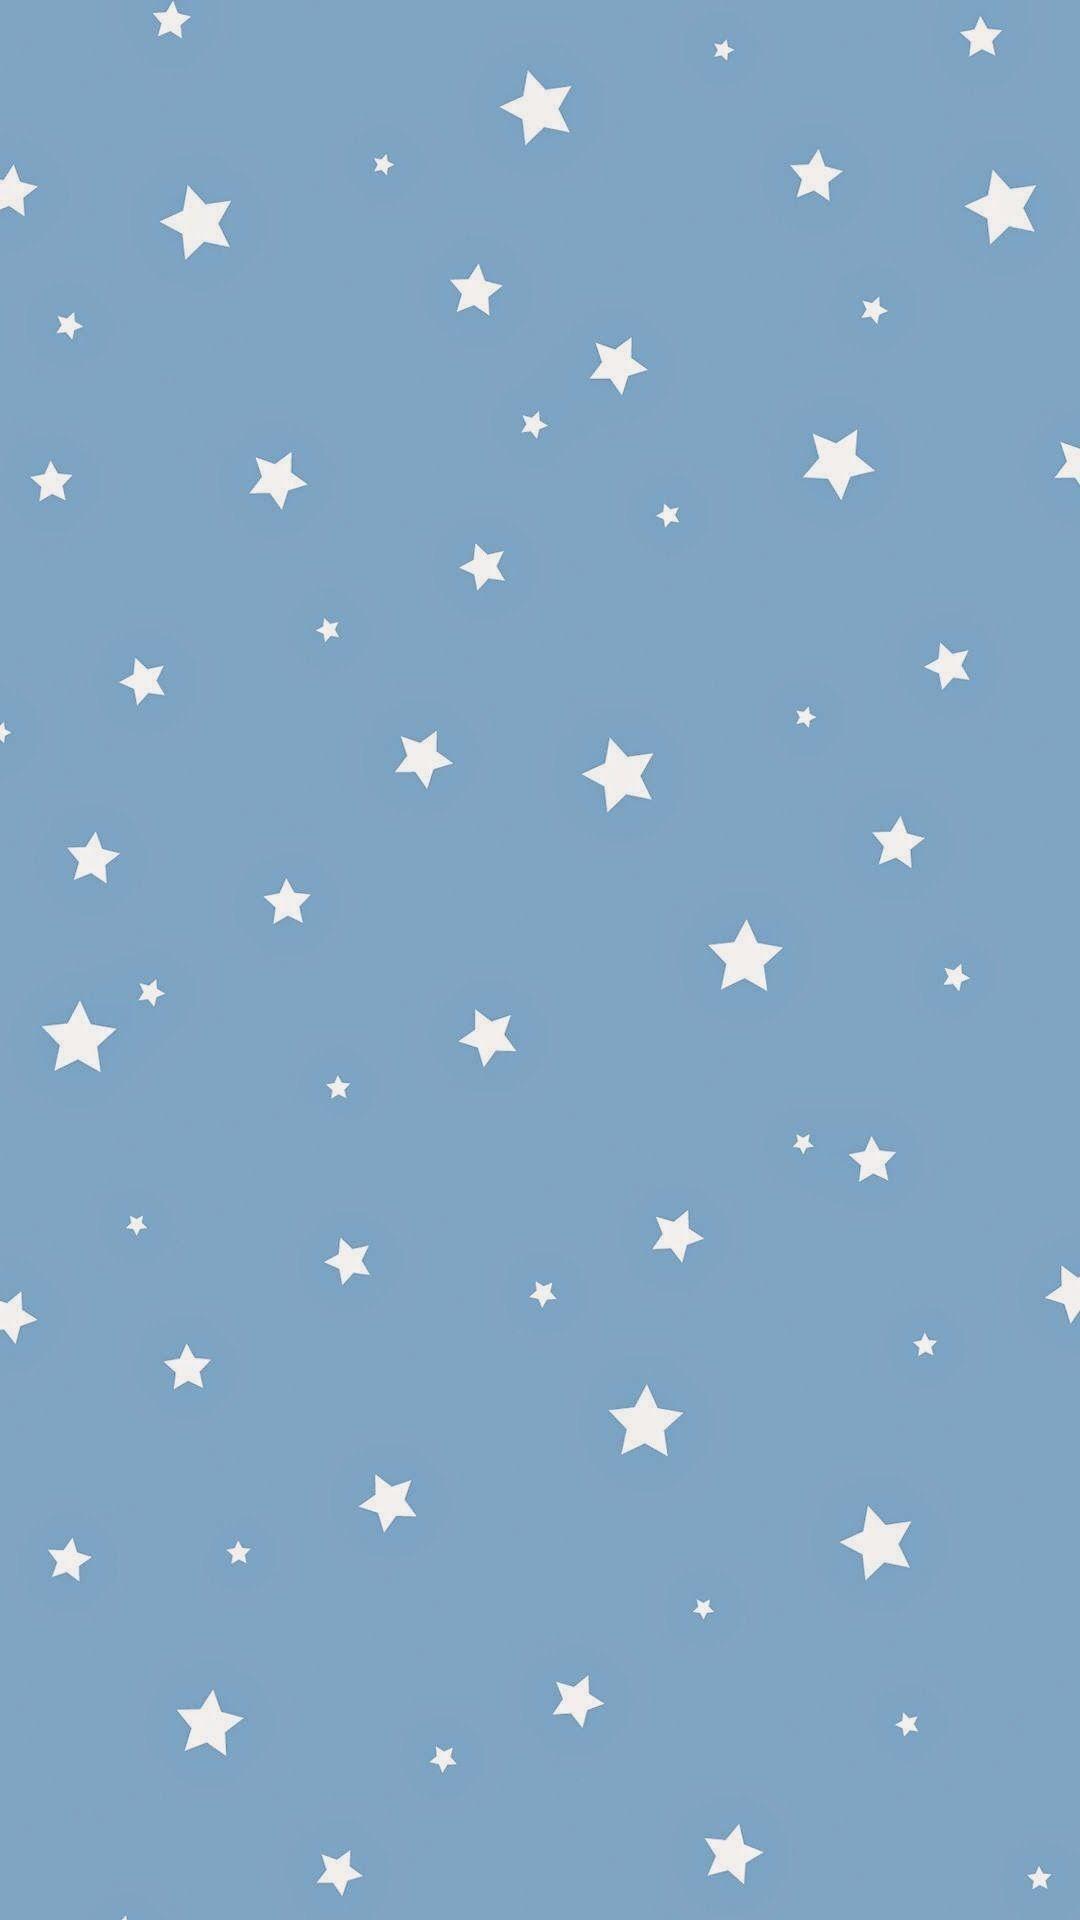 Google Image Result For Https Wallpaperplay Com Walls Full 7 C B 209341 Jpg Baby Blue Wallpaper Baby Blue Aesthetic Blue Wallpaper Iphone